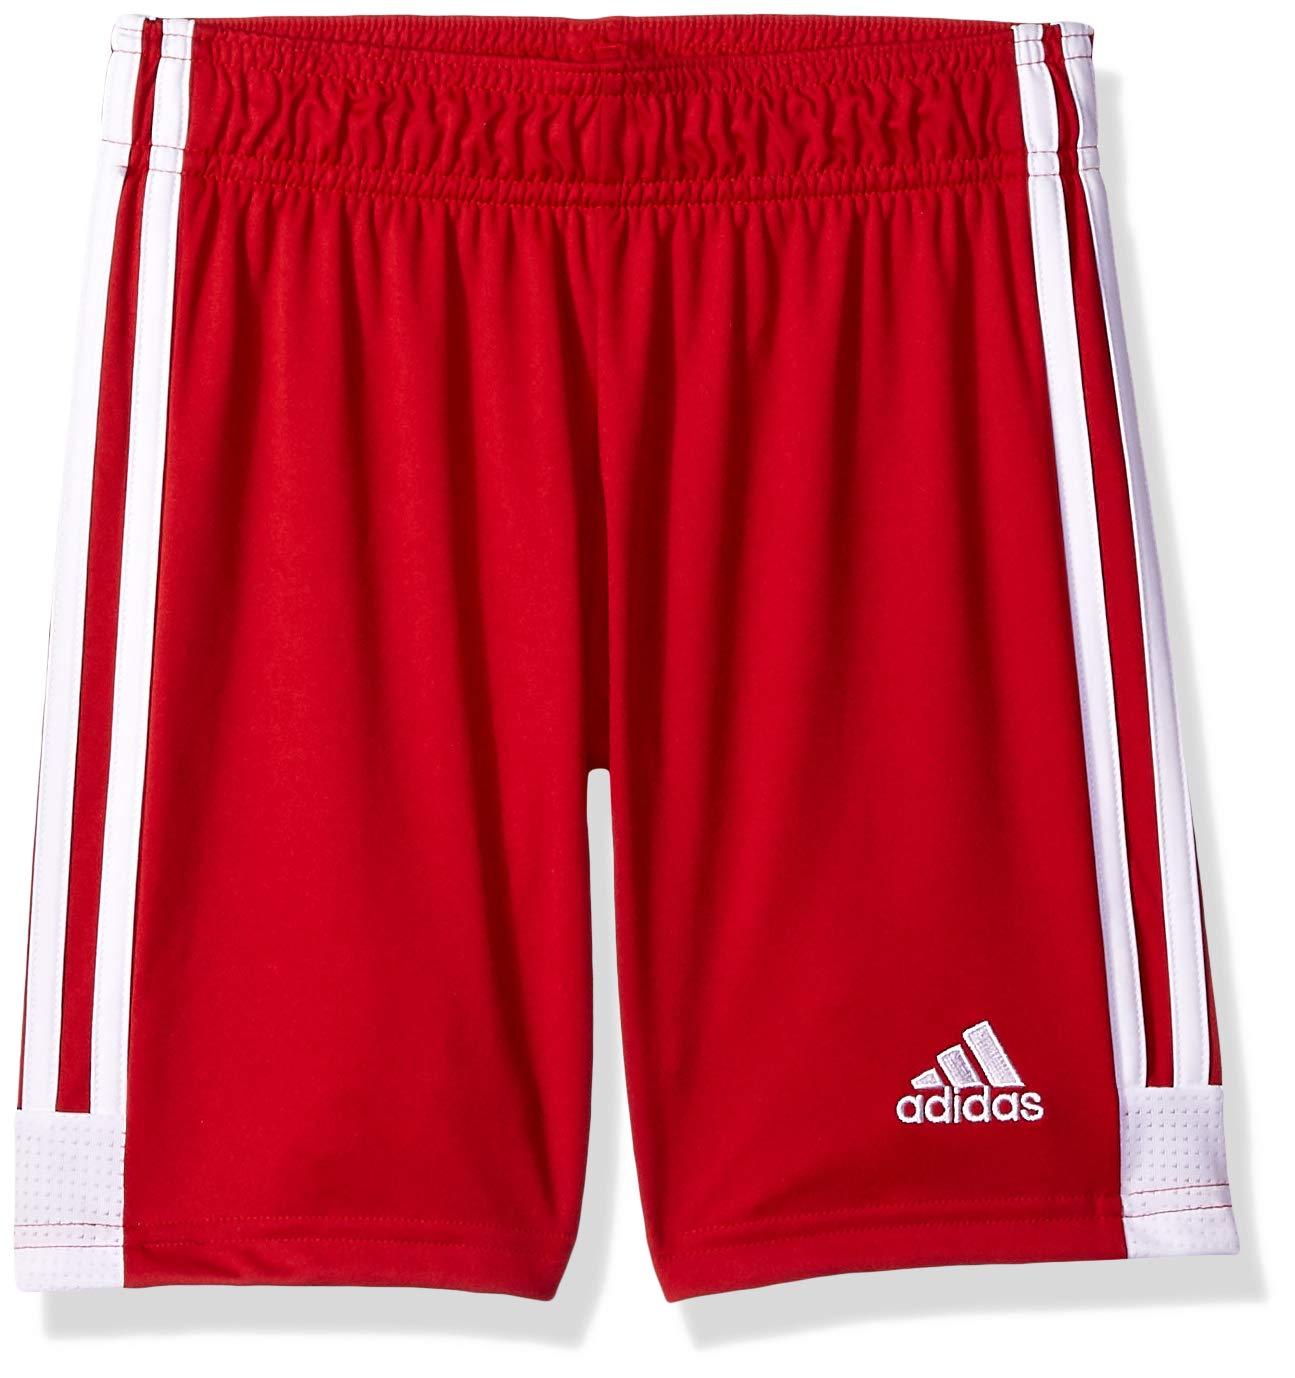 adidas Men's Tastigo 19 Shorts, Power Red/White, Youth Small by adidas